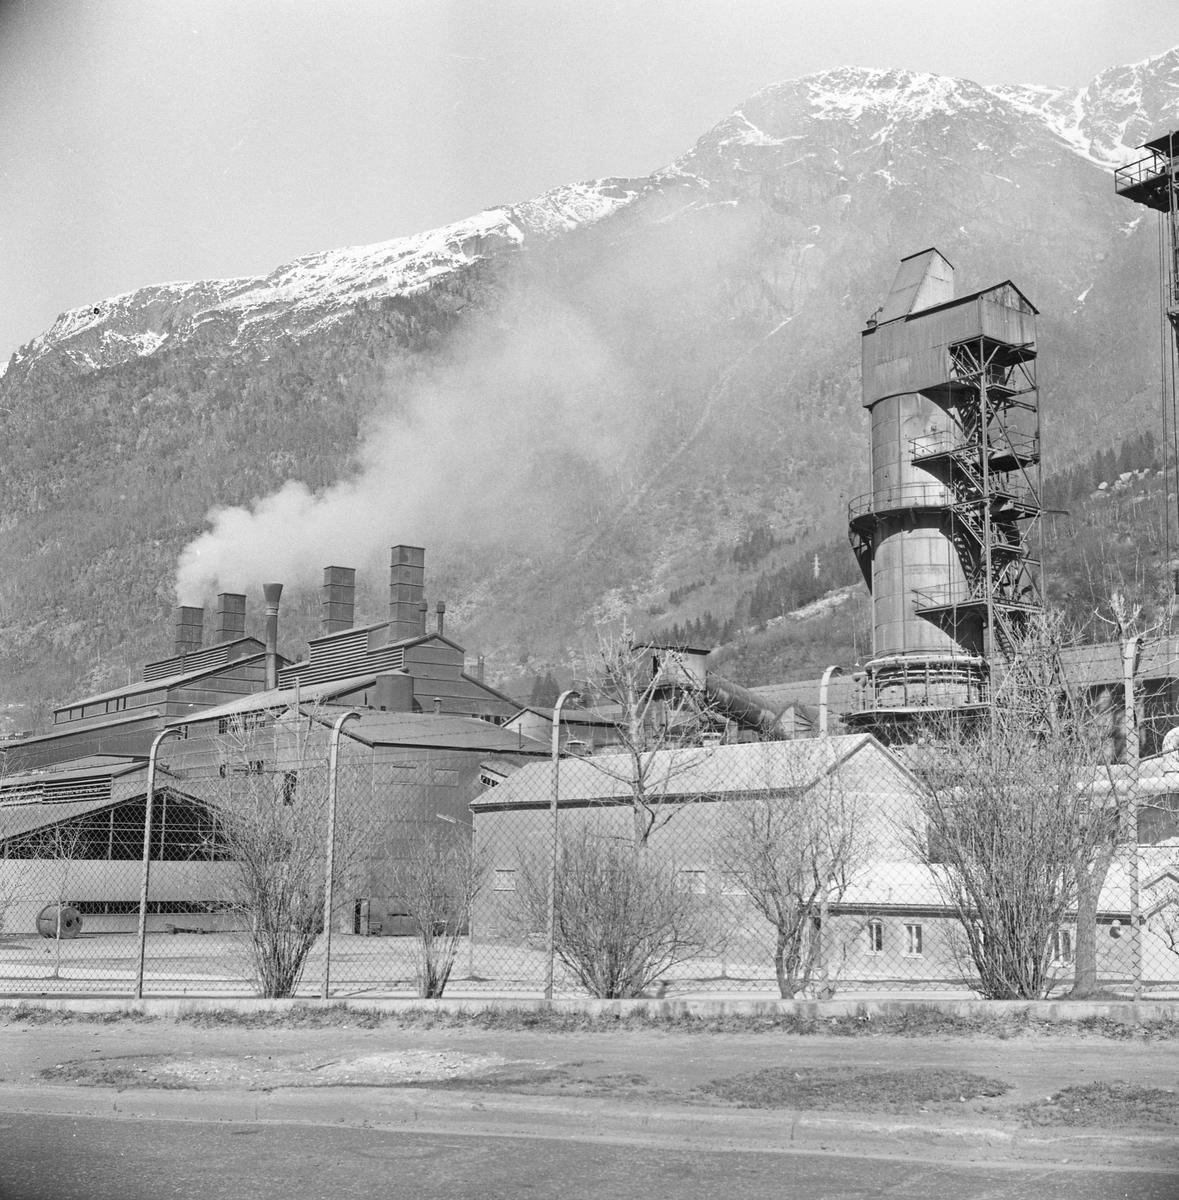 Odda Smelteverk